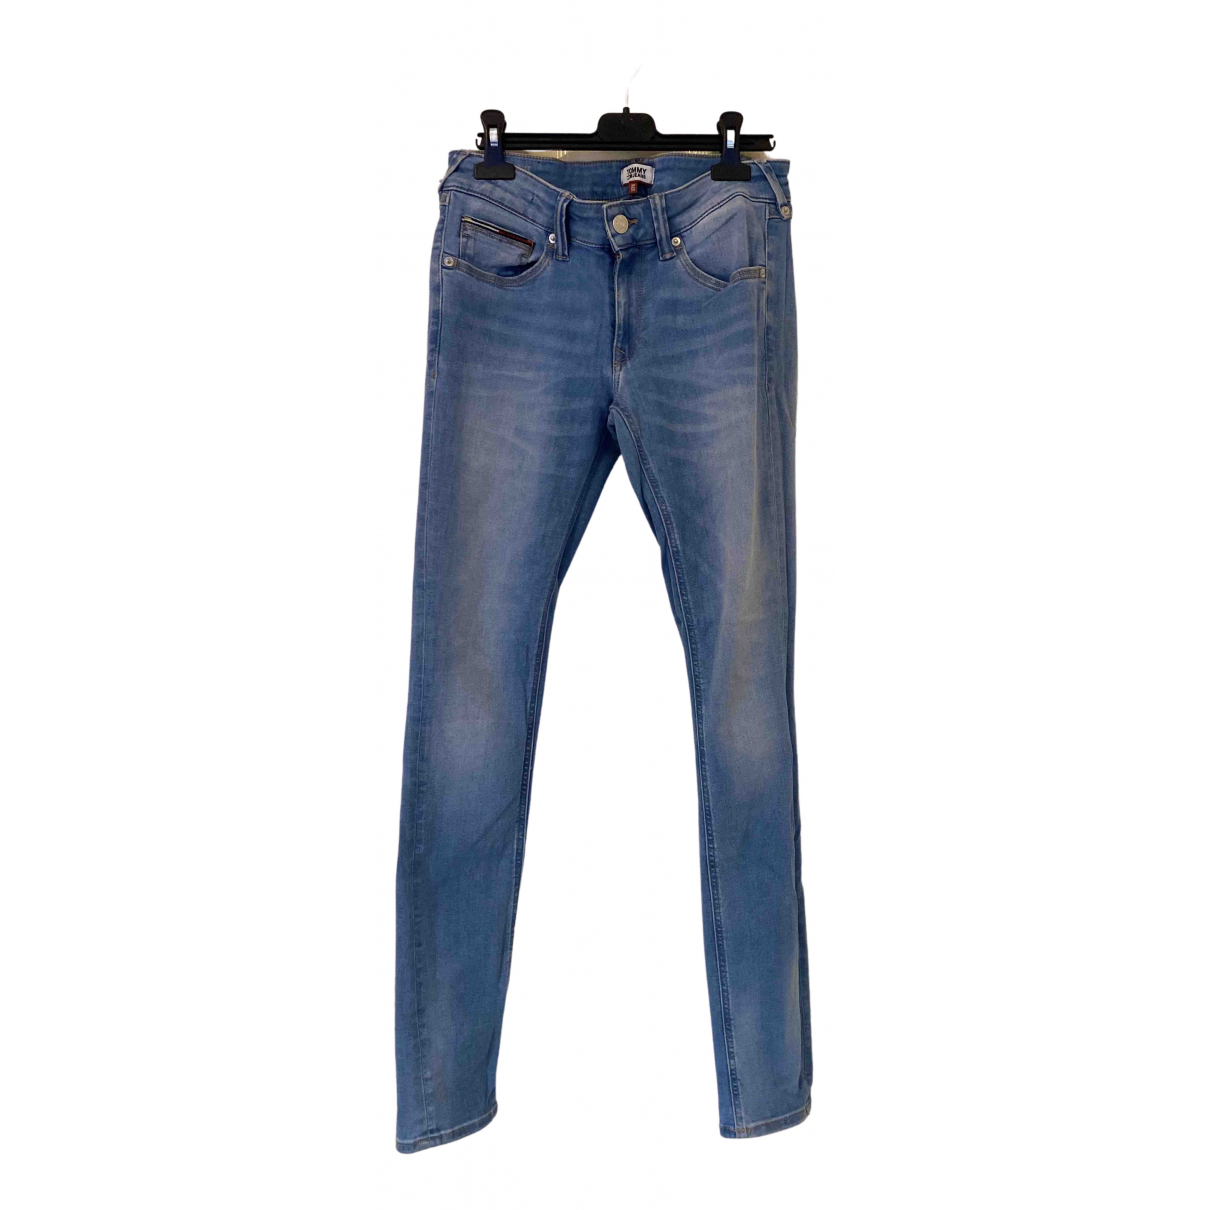 Tommy Jeans N Blue Denim - Jeans Jeans for Women 40 FR